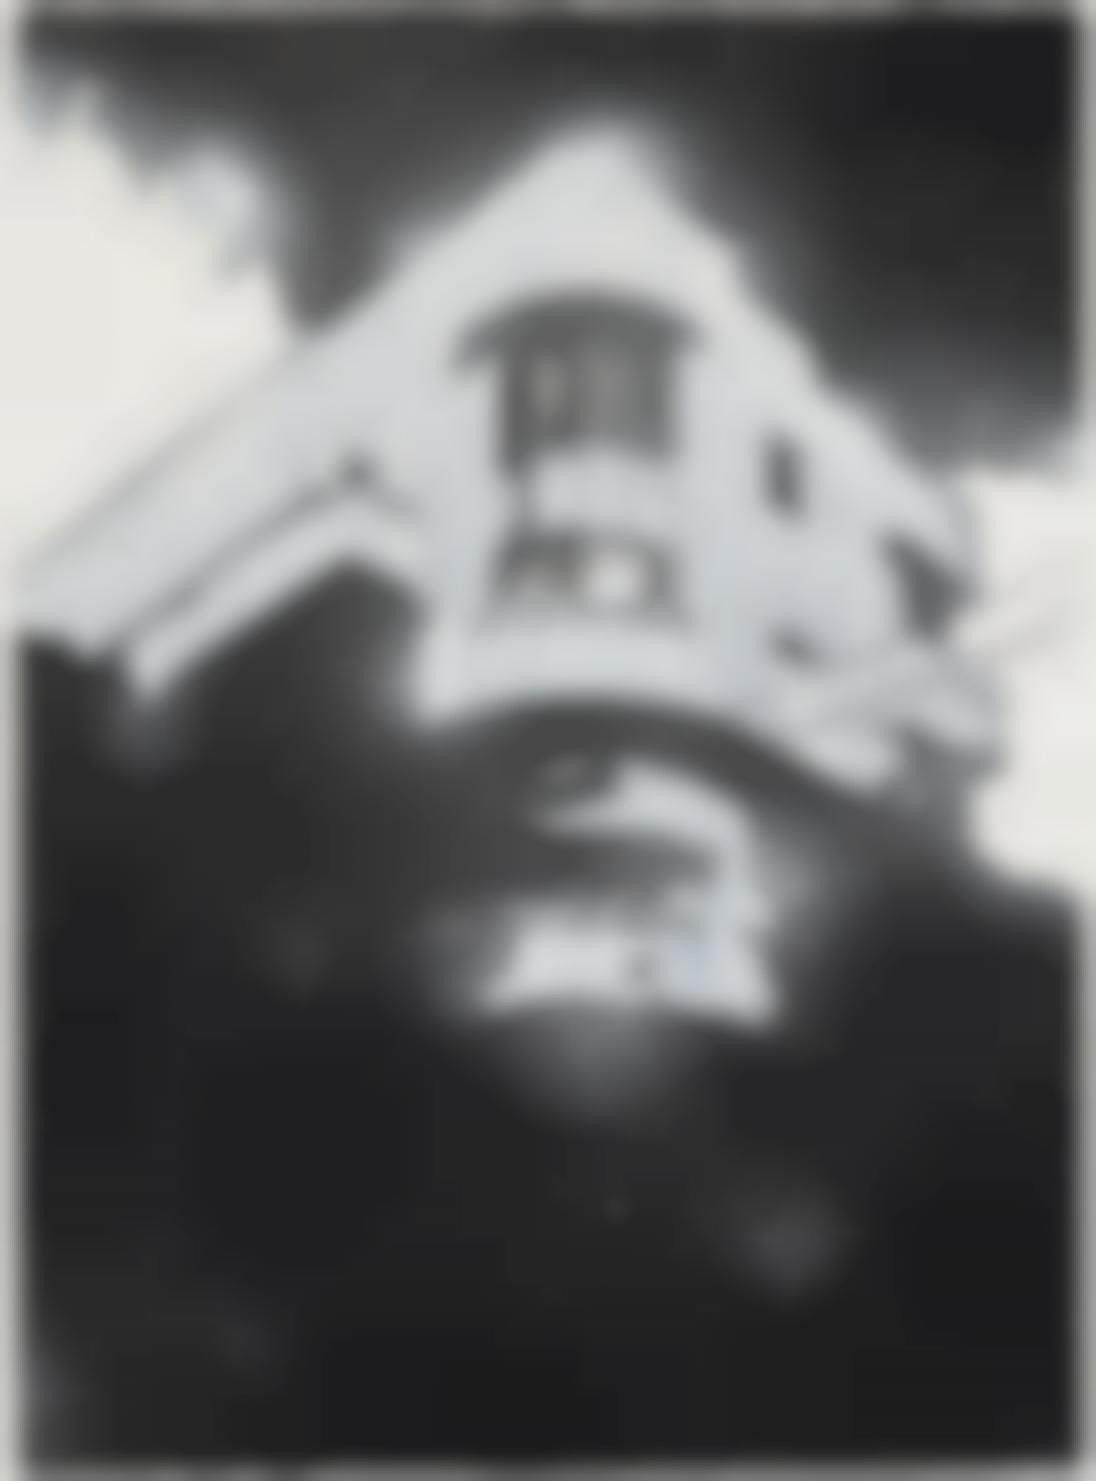 Jan Davidoff - The House One-2014